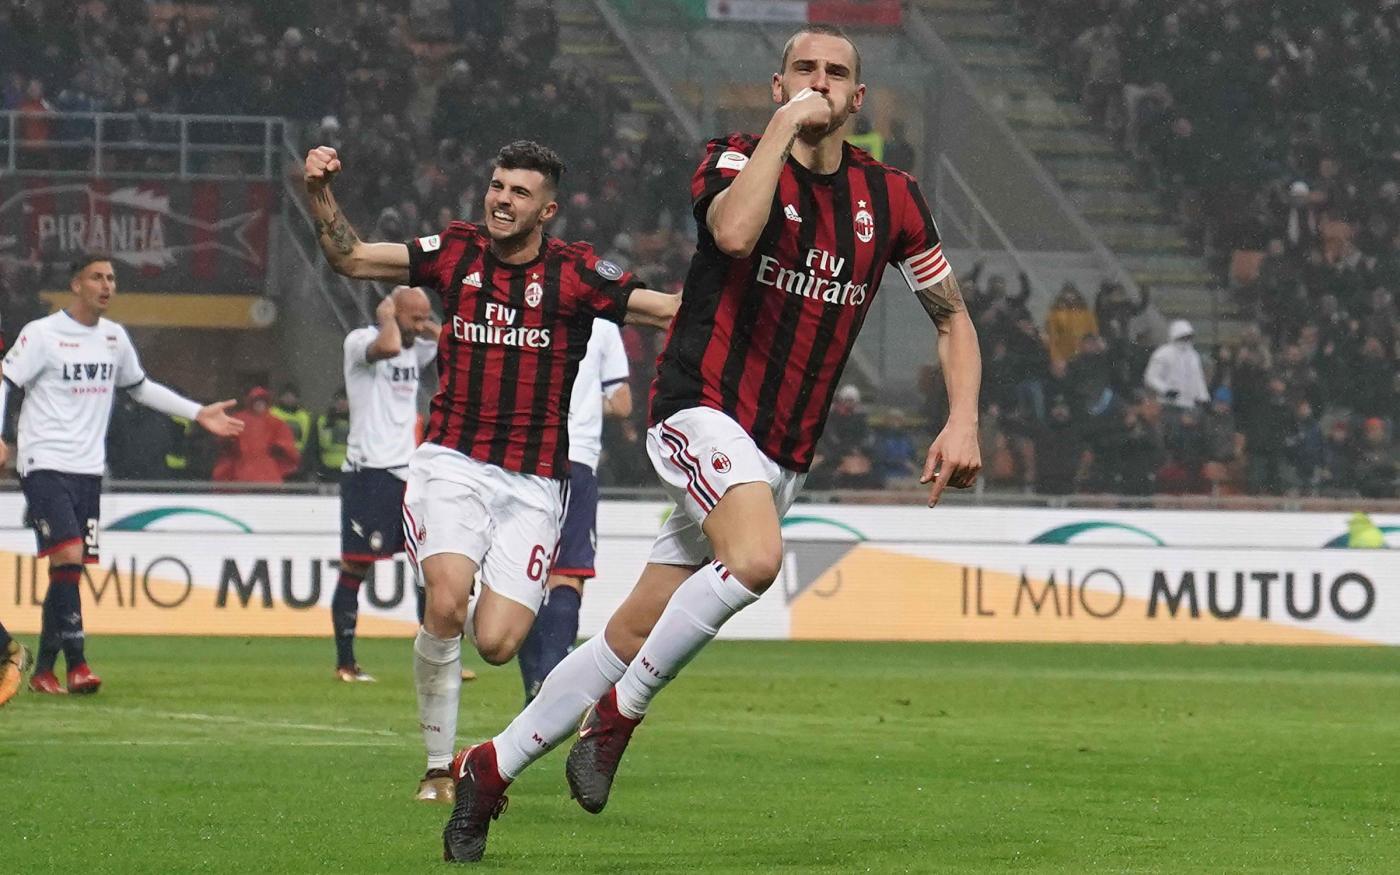 Mercato - Inzaghi: